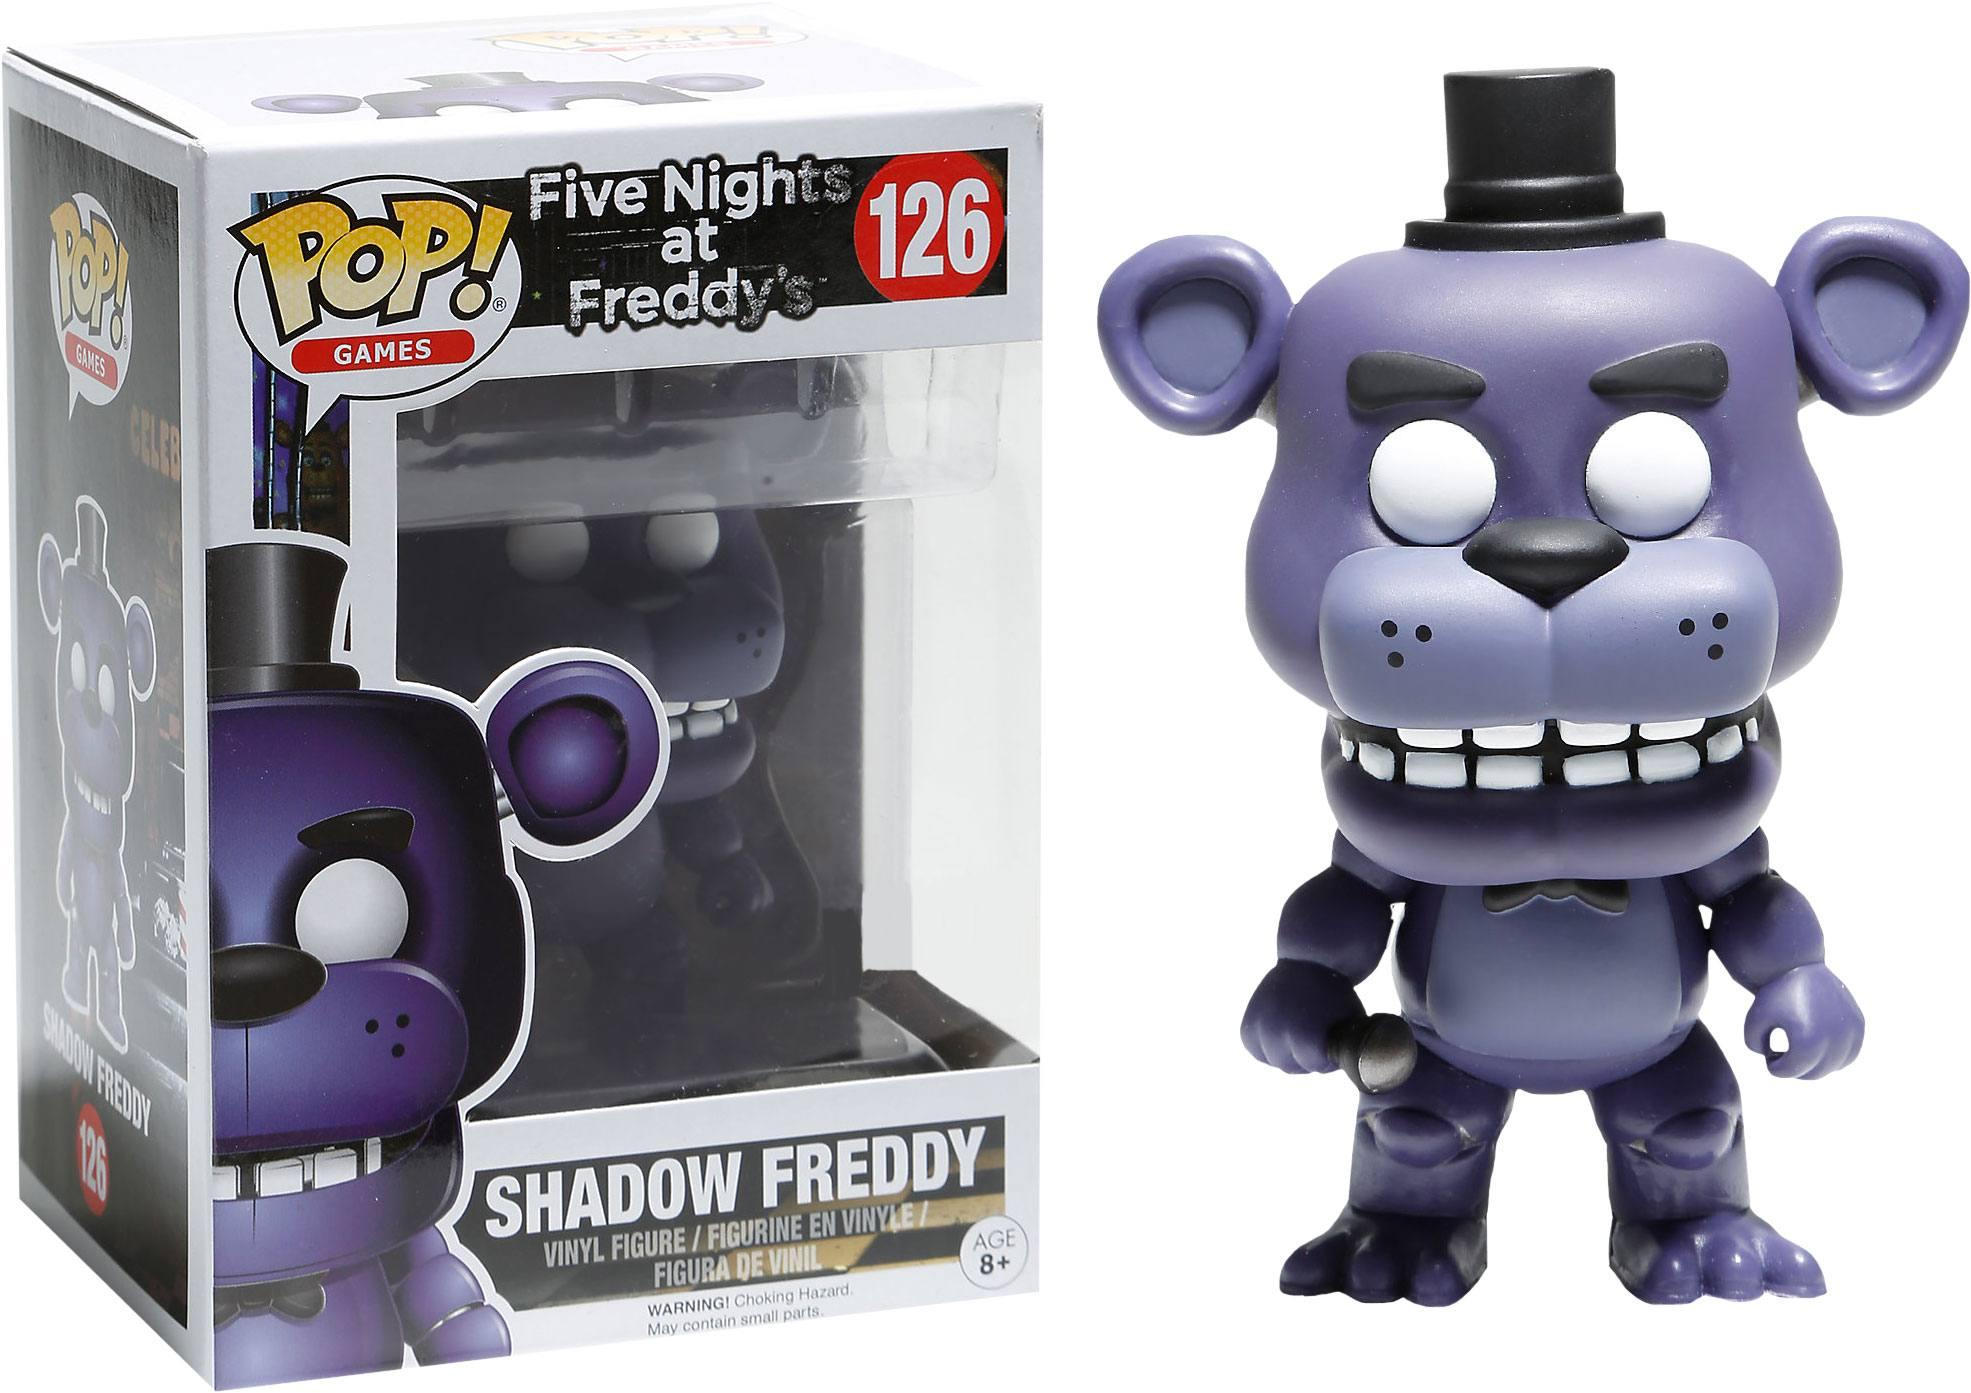 Five Nights at Freddy's POP! Games Vinyl Figure Shadow Freddy 9 cm